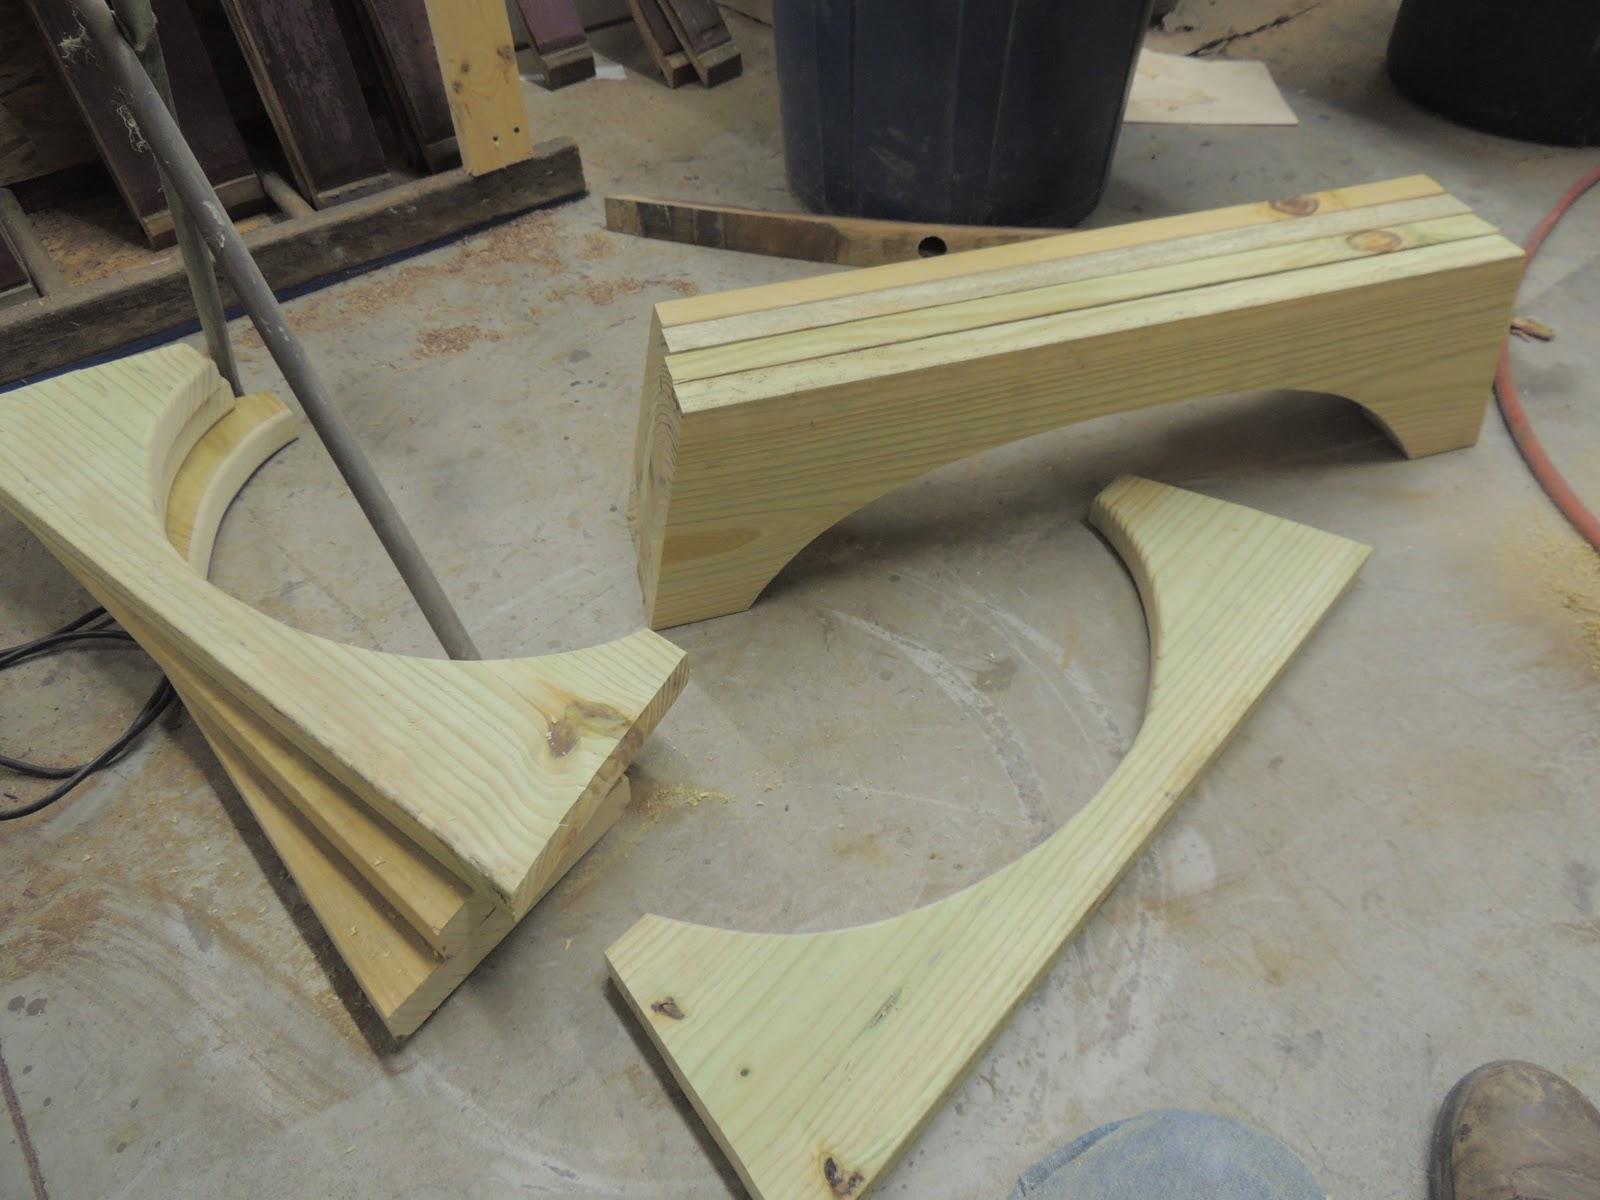 Best Source For Woodworking Plans: Wine Barrel Bar Plans Wooden Plans